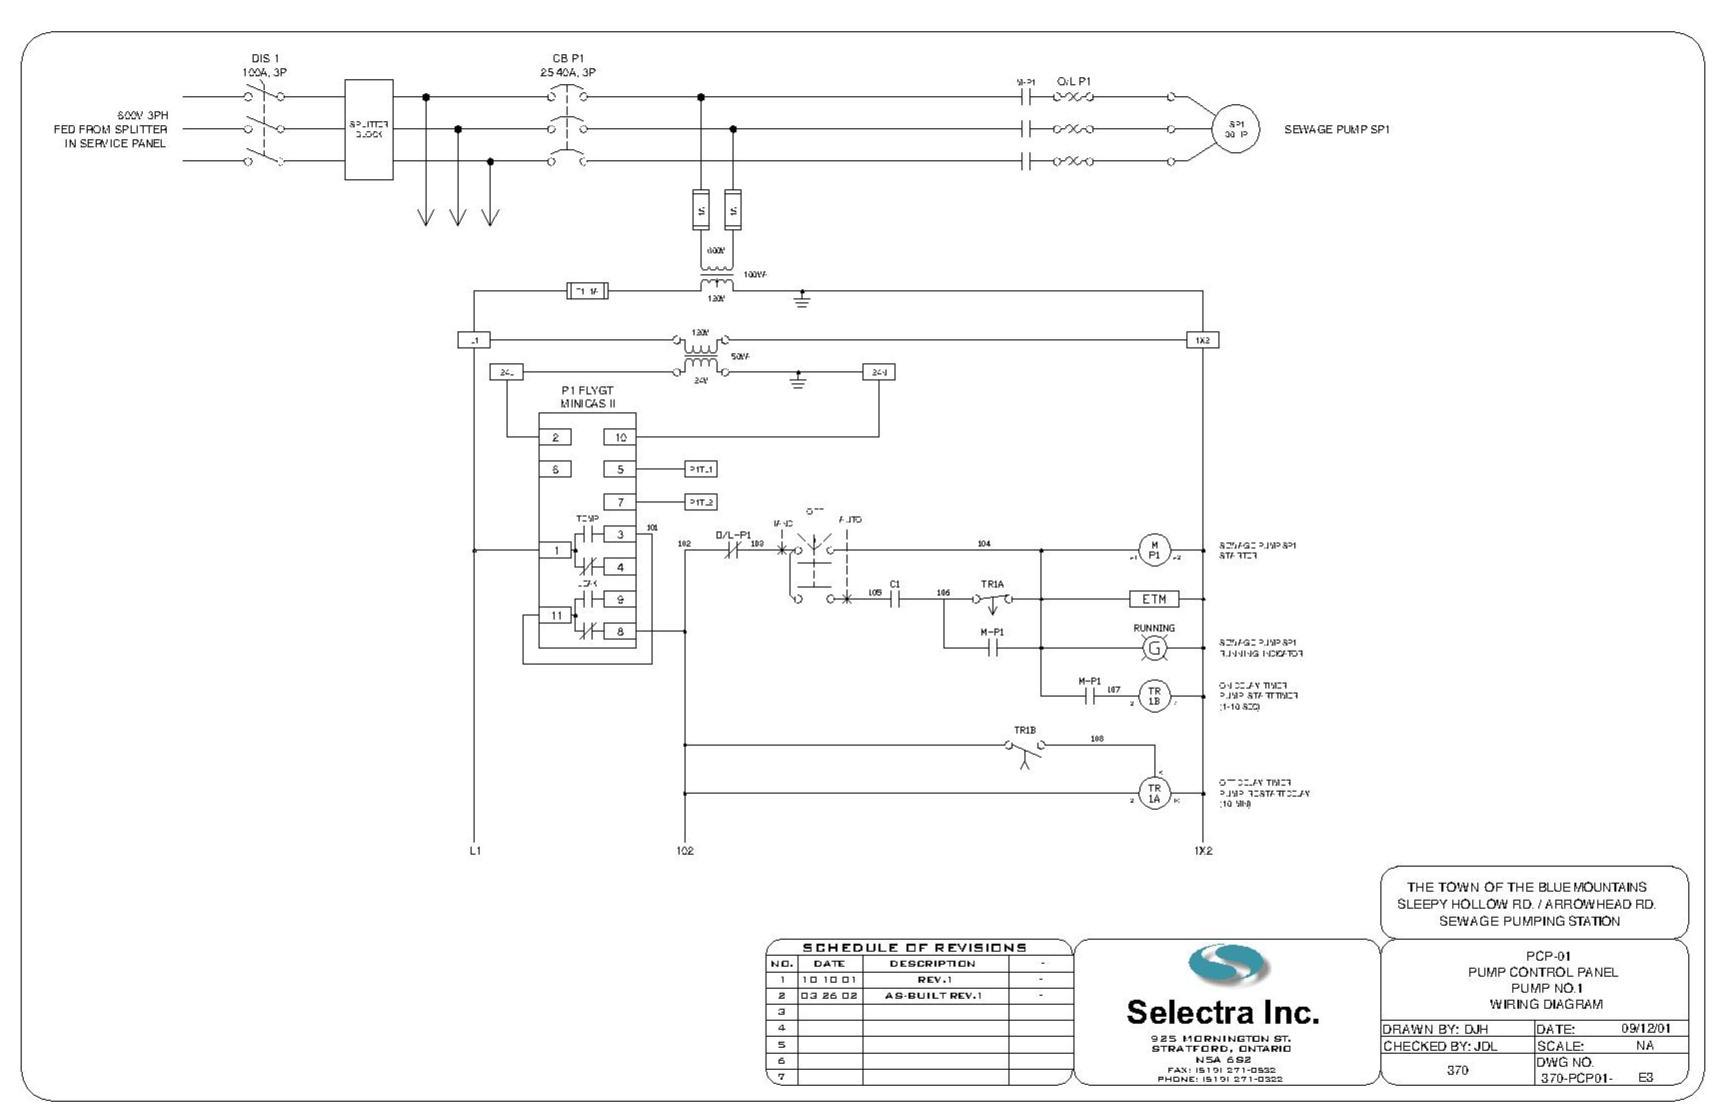 WRG-7297] Fire Pump Controller Wiring Diagram